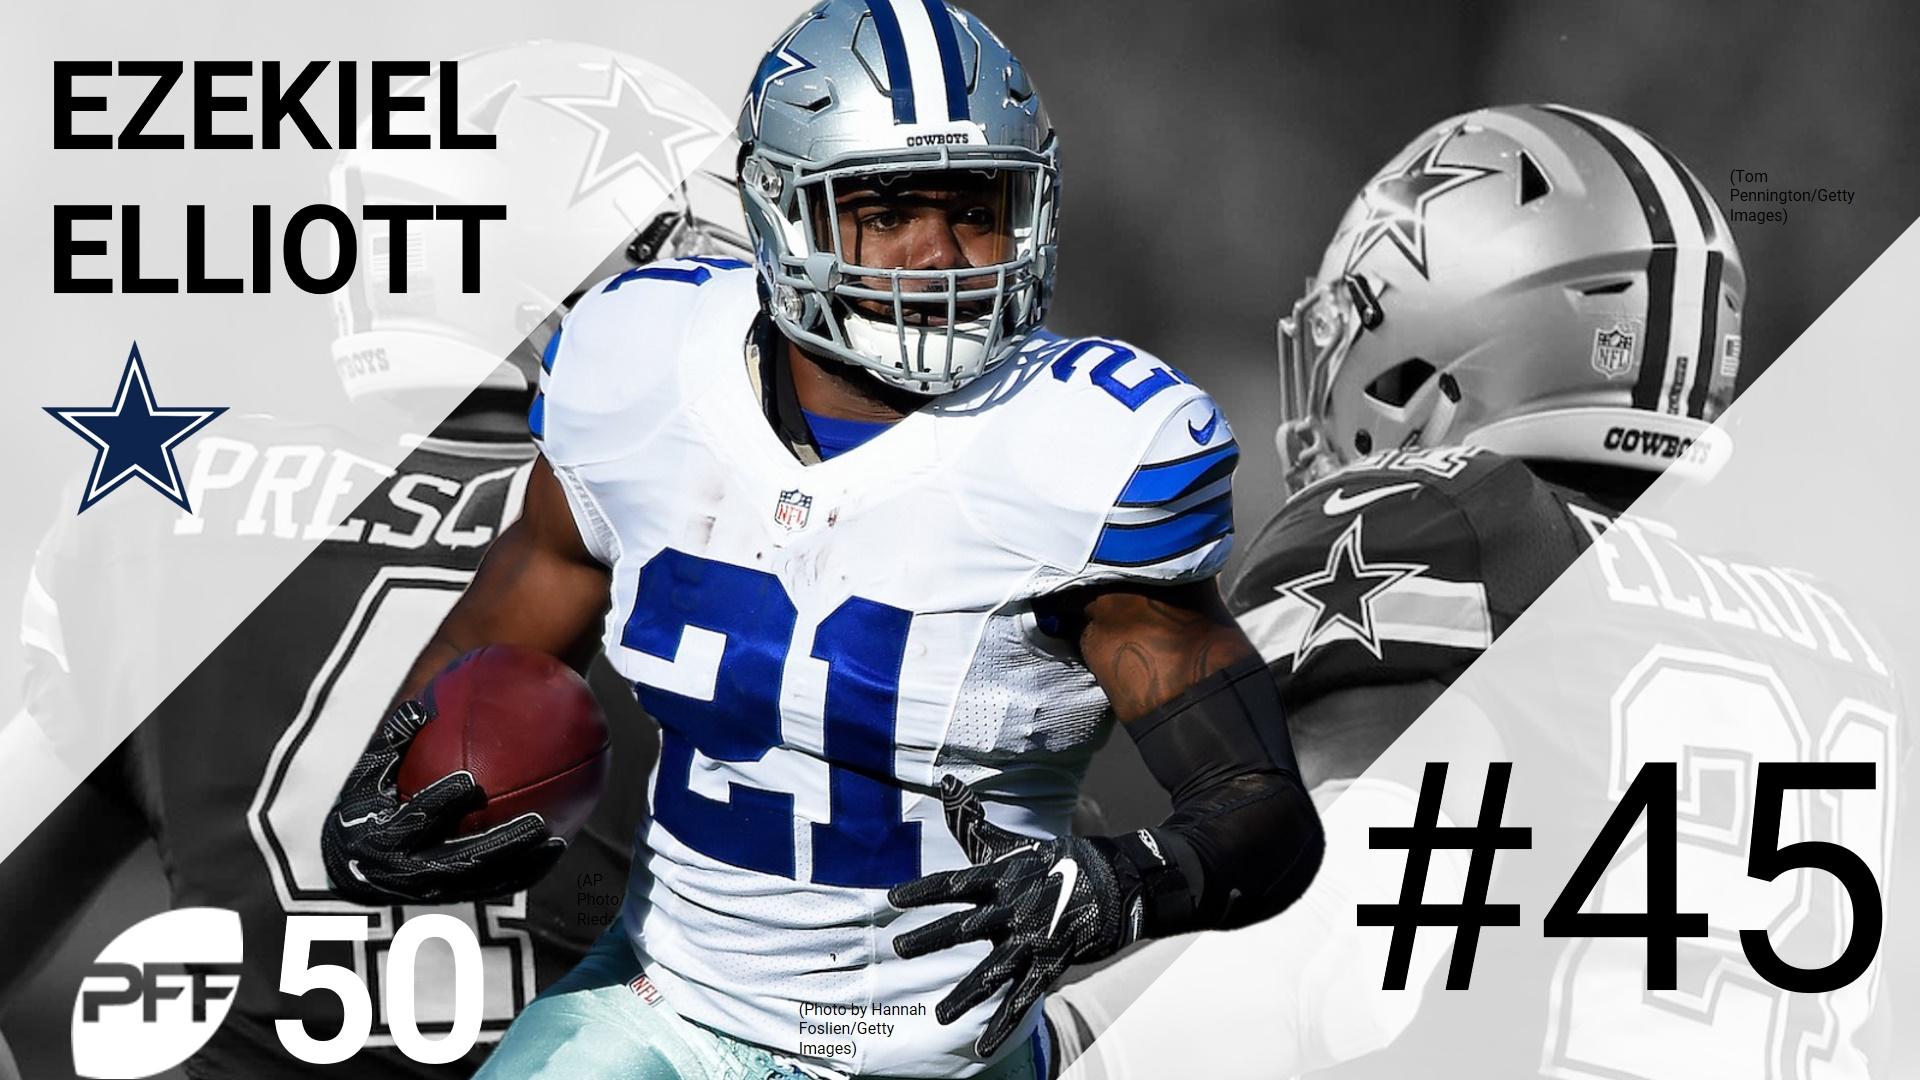 45 Ezekiel Elliott